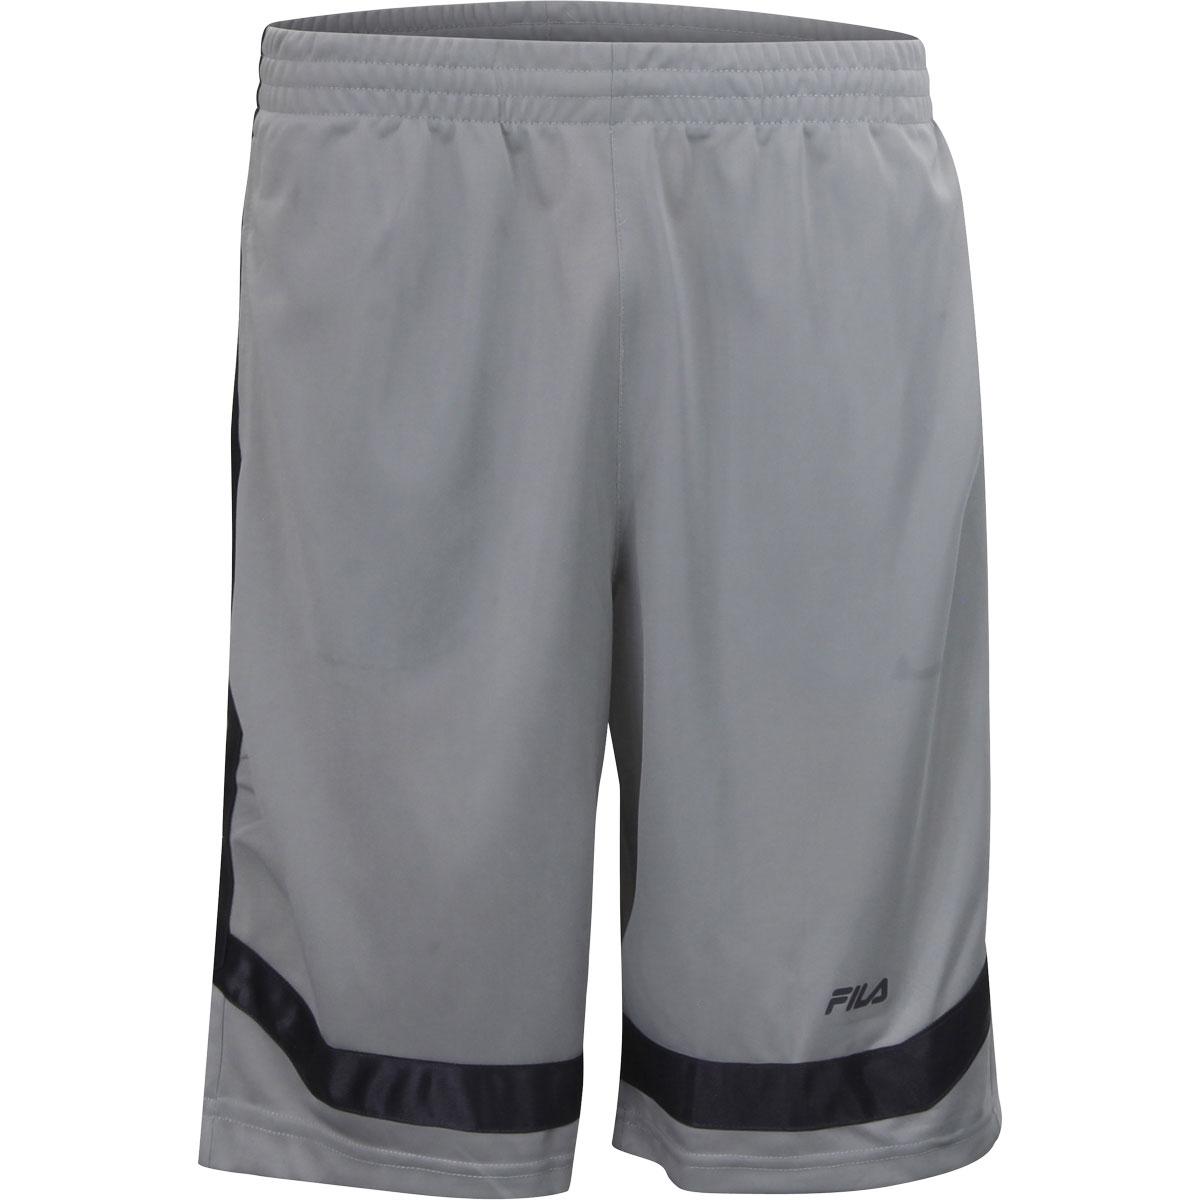 7c40aab833ec Fila Men s Circuit Drawstring Shorts